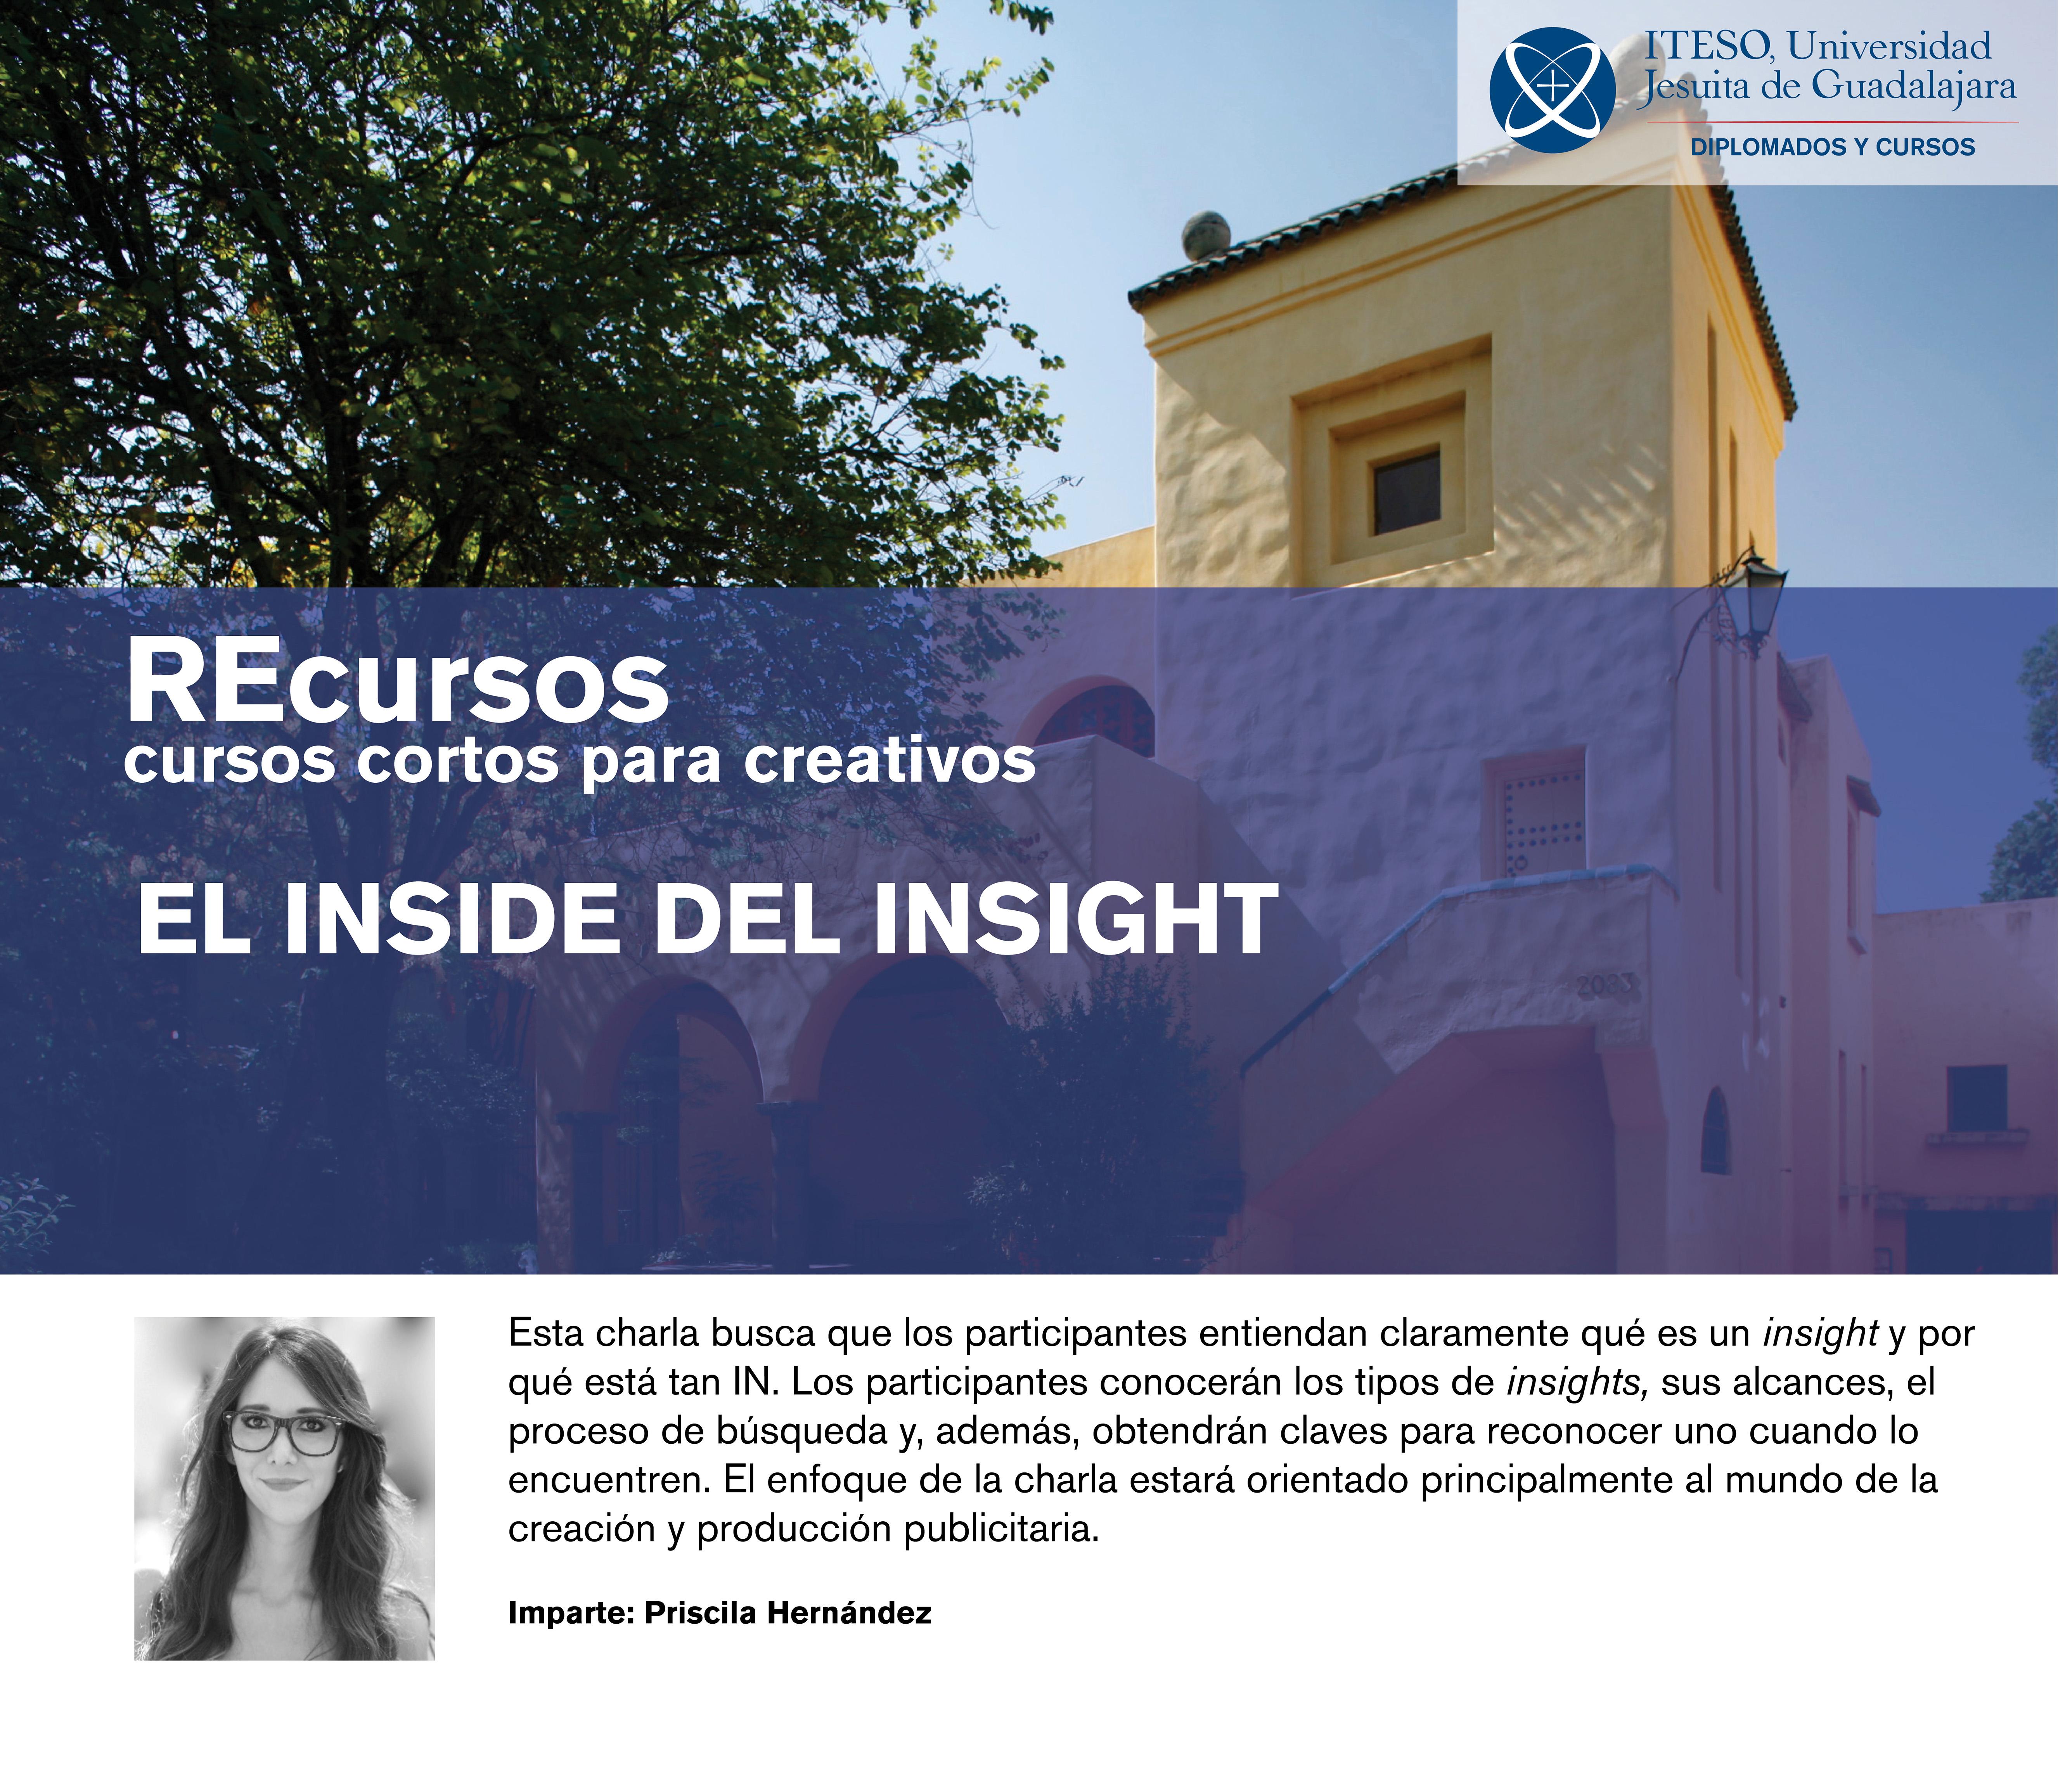 EL INSIDE DEL INSIGHT